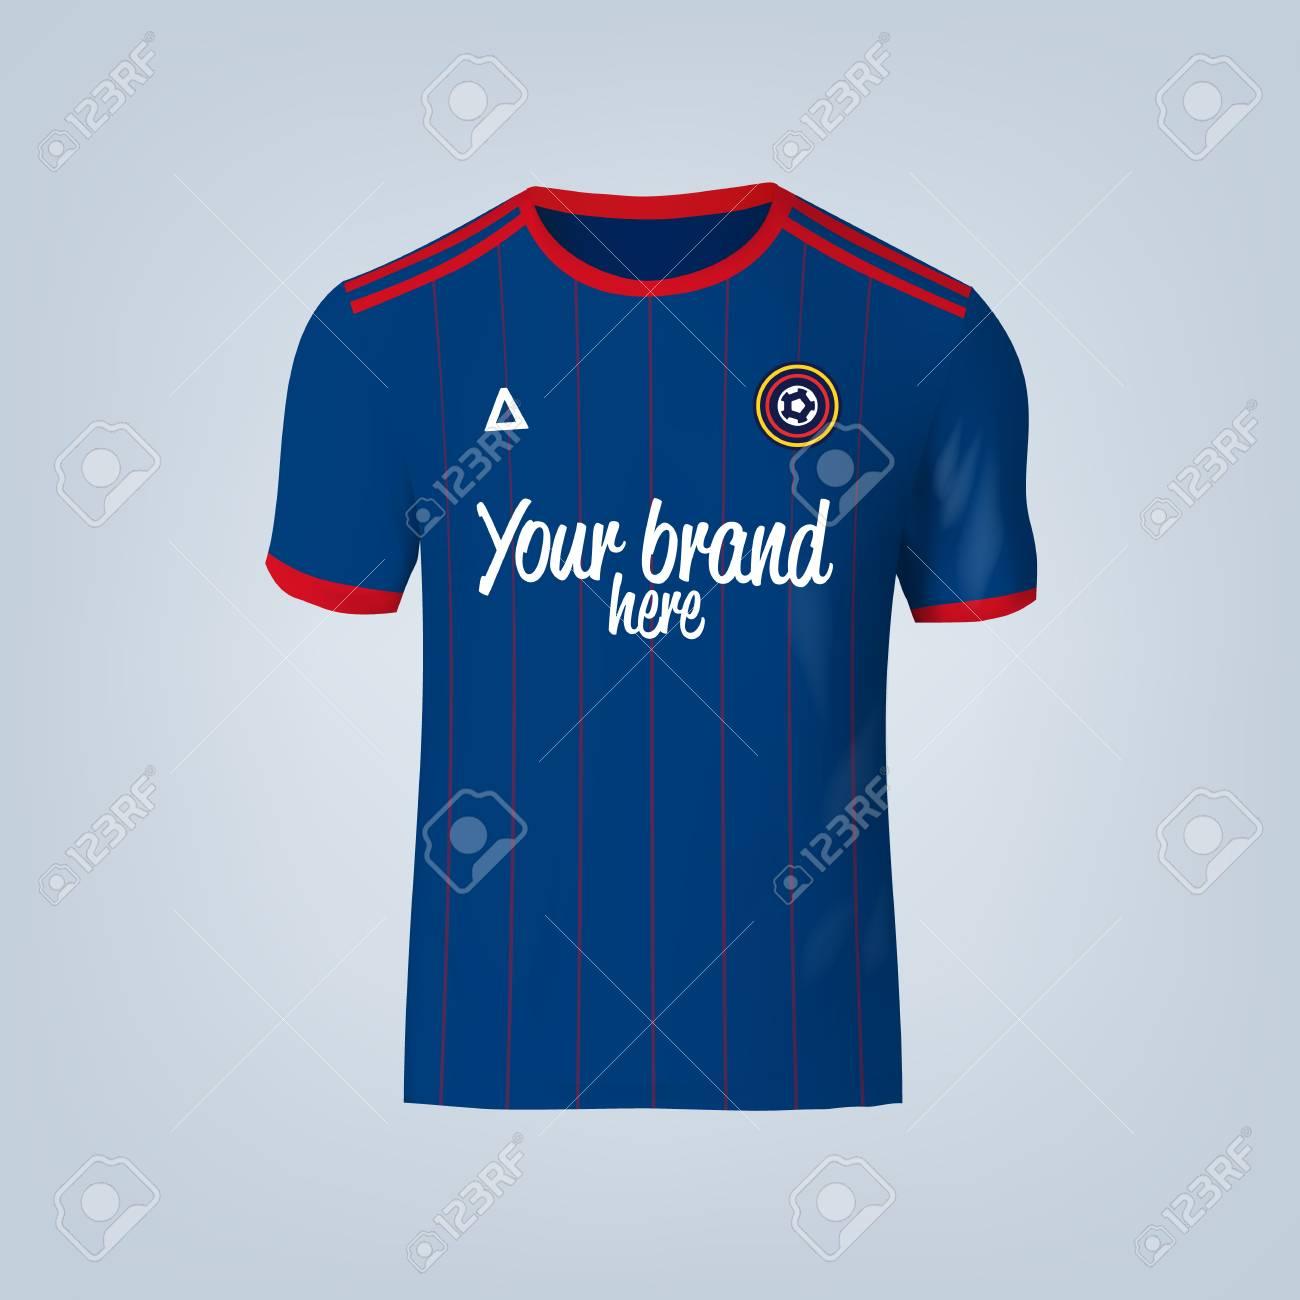 Vector illustration of football t-shirt template. - 84013142